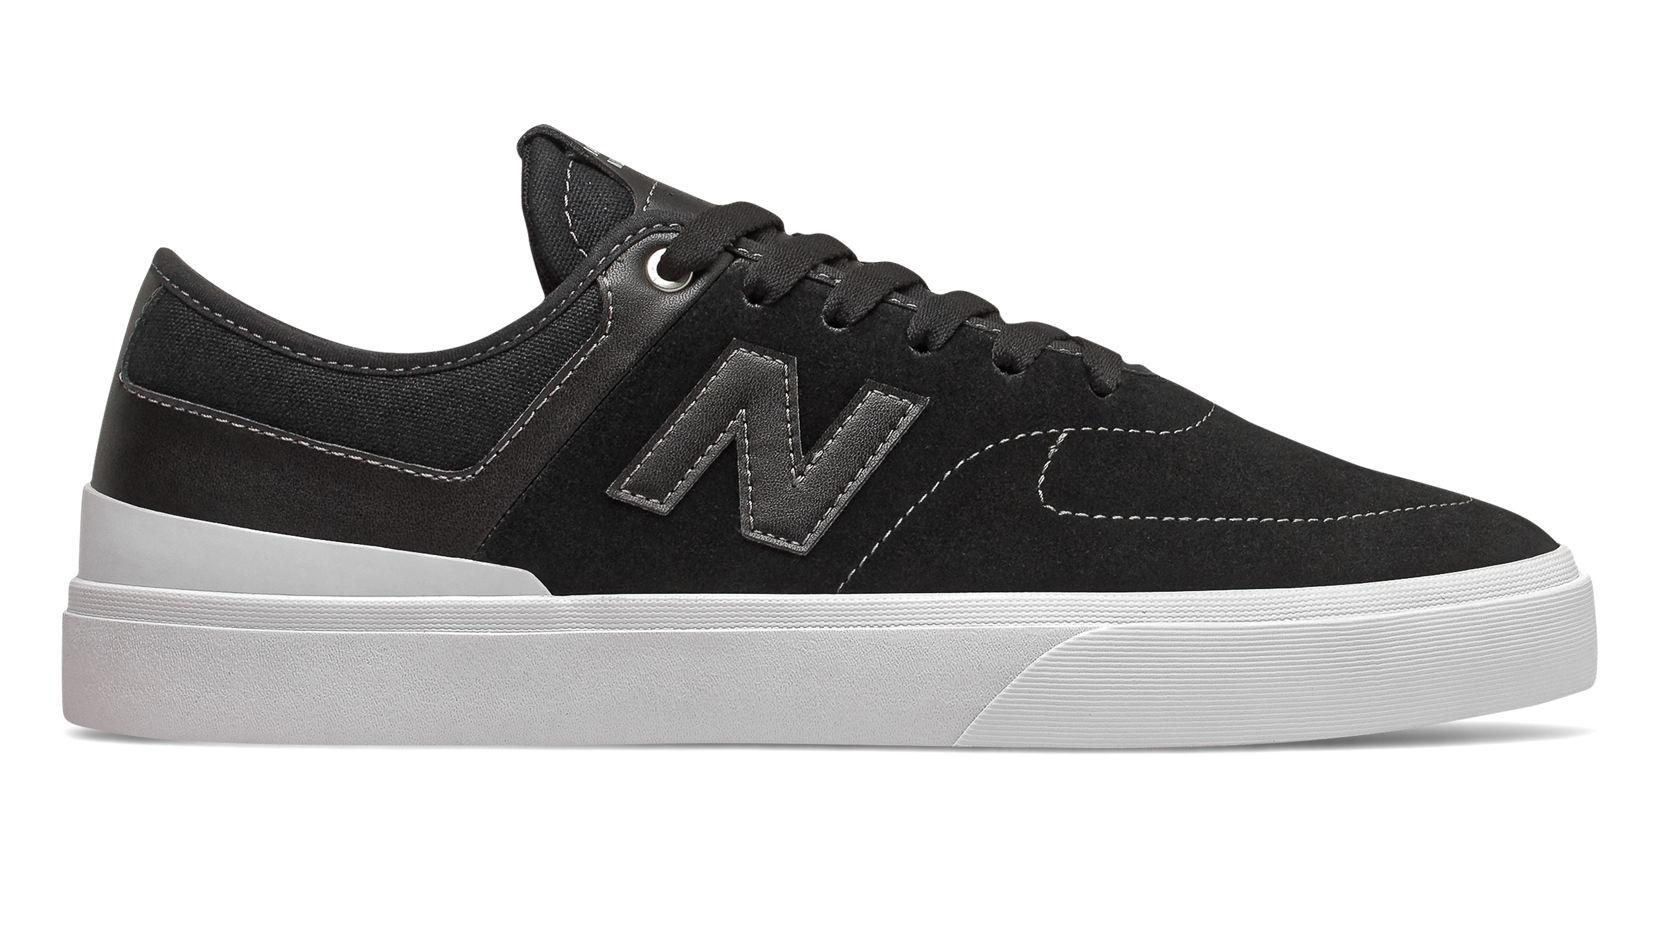 NB NUMERIC NB NUMERIC 379 BLACK / WHITE